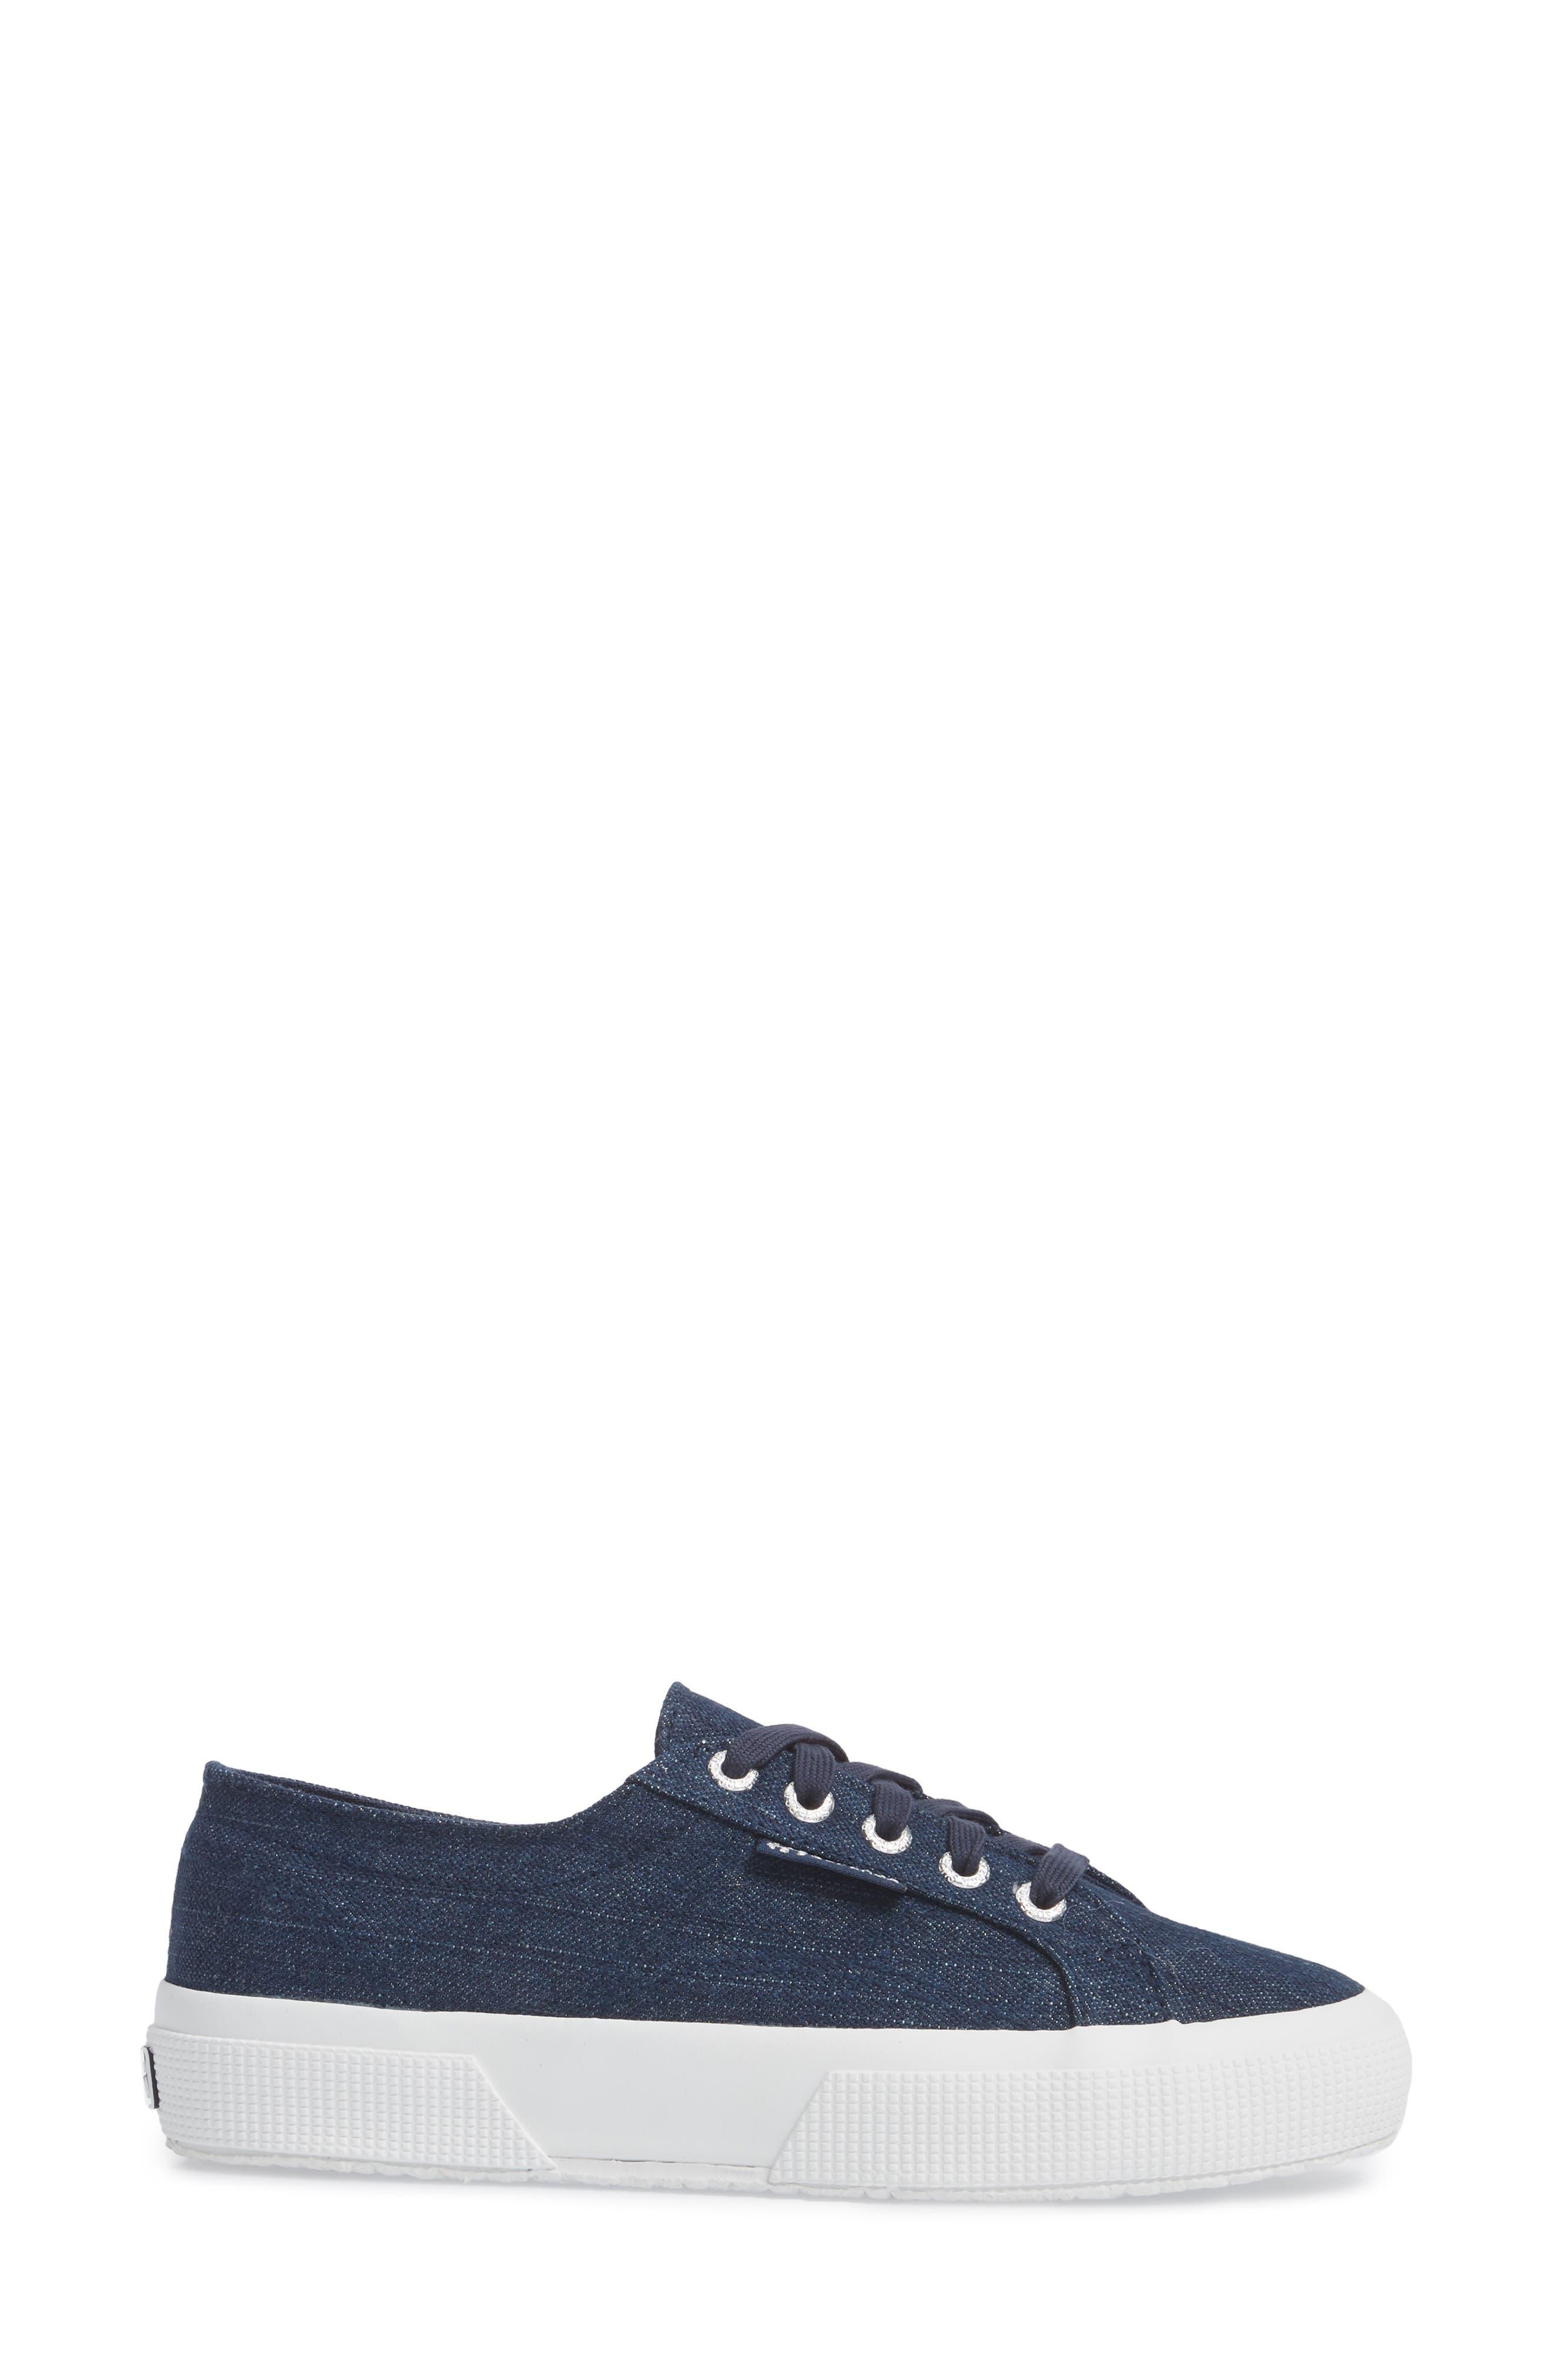 Alternate Image 3  - Superga 2750 Sneaker (Women)